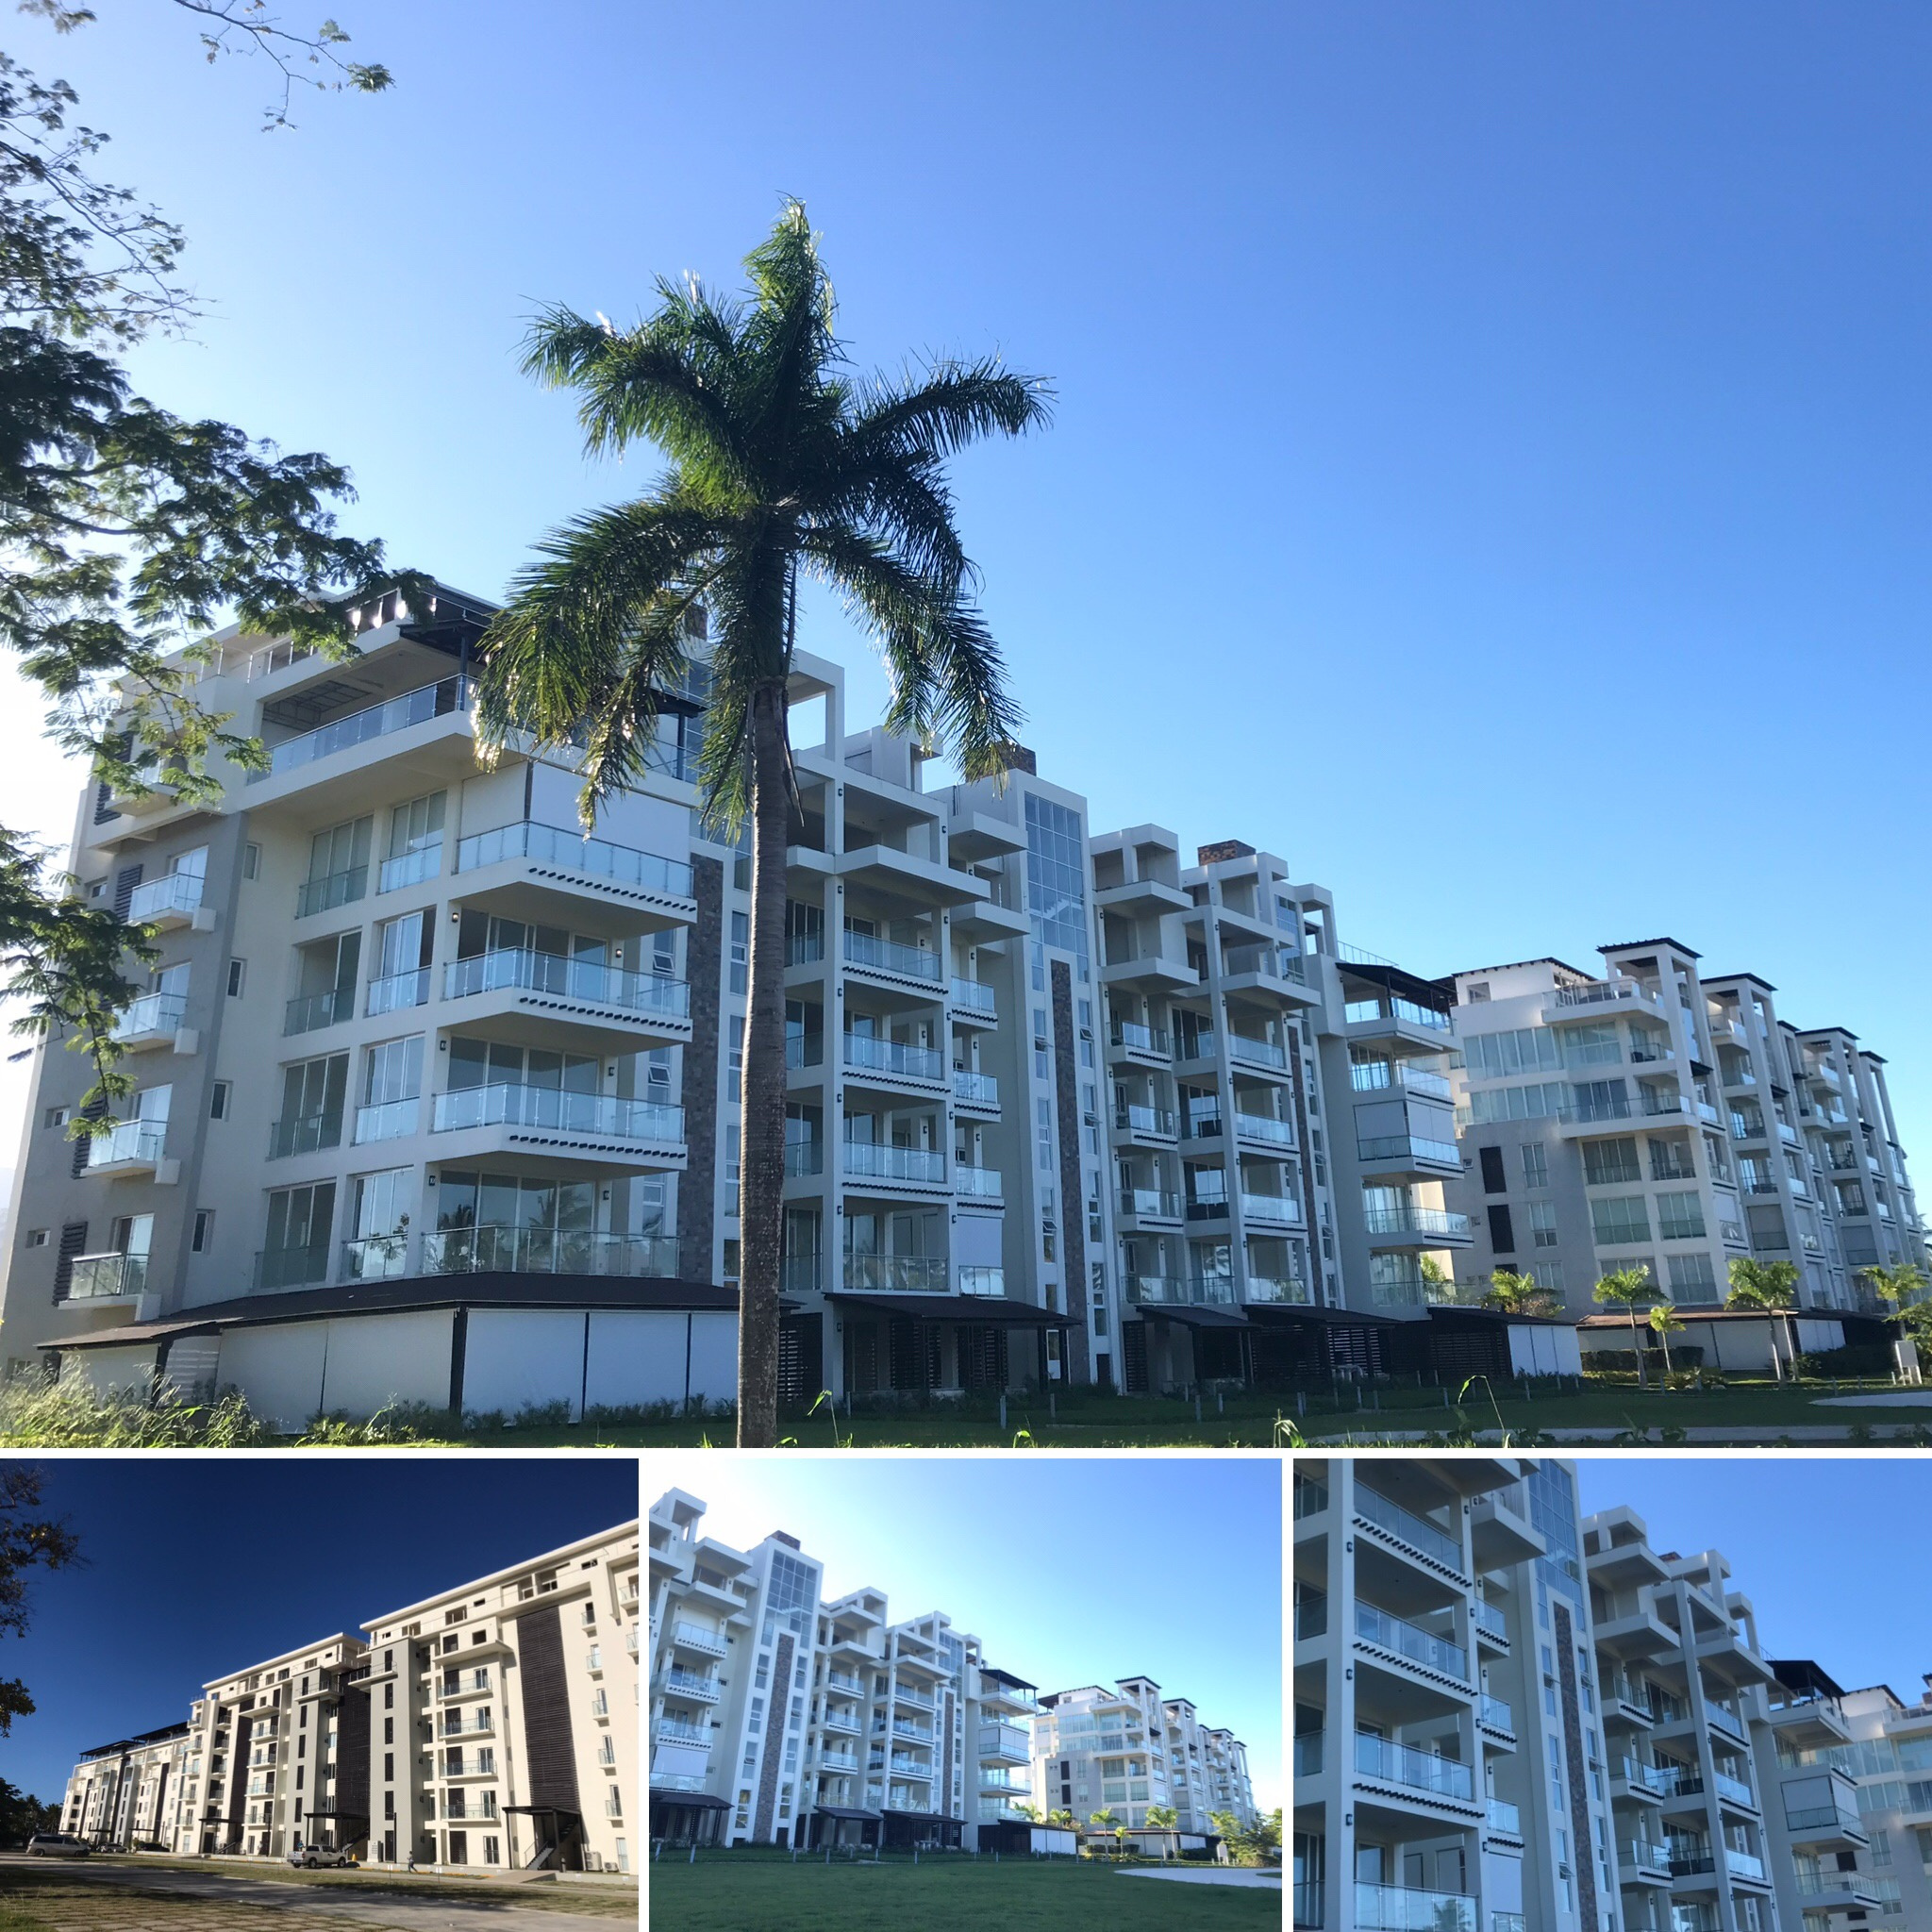 Hotel Blue Jack Tar, Edificios 1 & 2